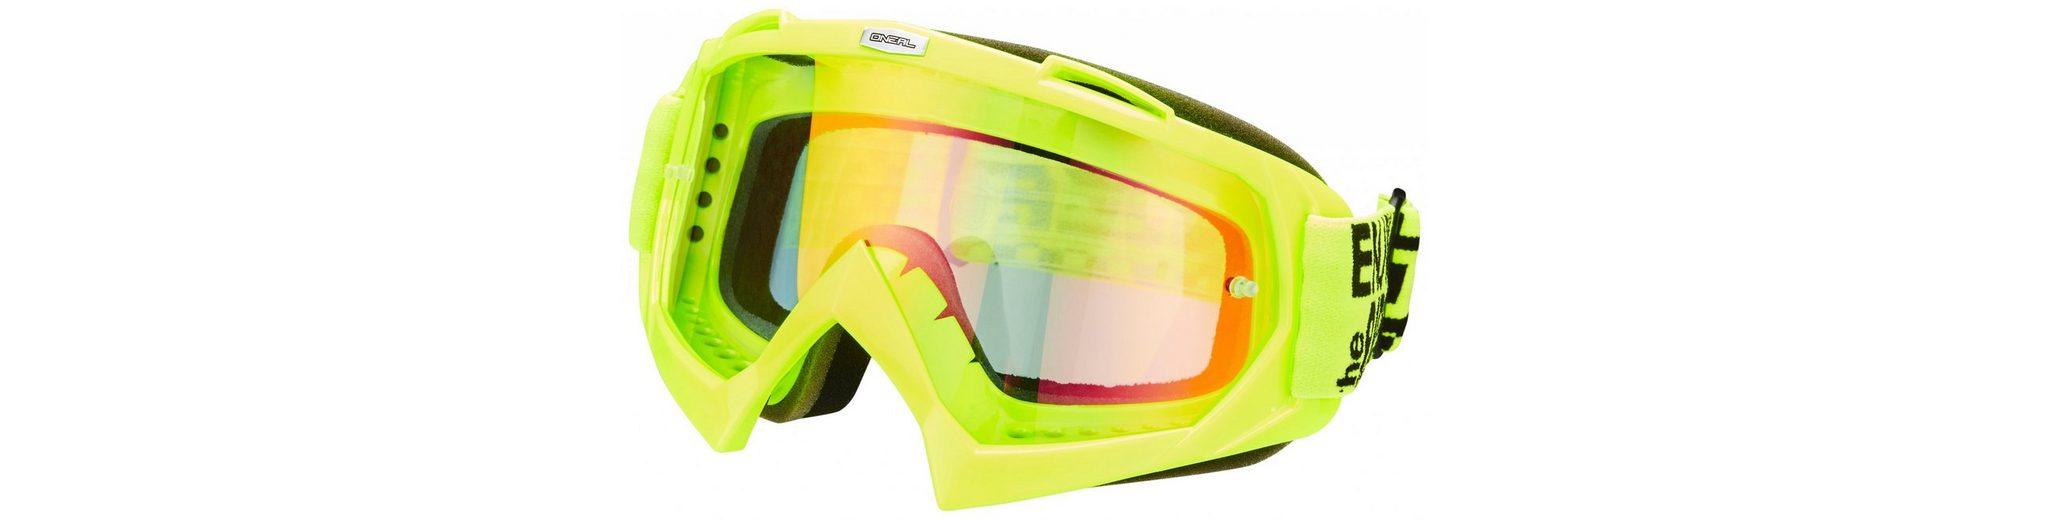 O'NEAL Radsportbrille »B-Flex Launch Goggle«